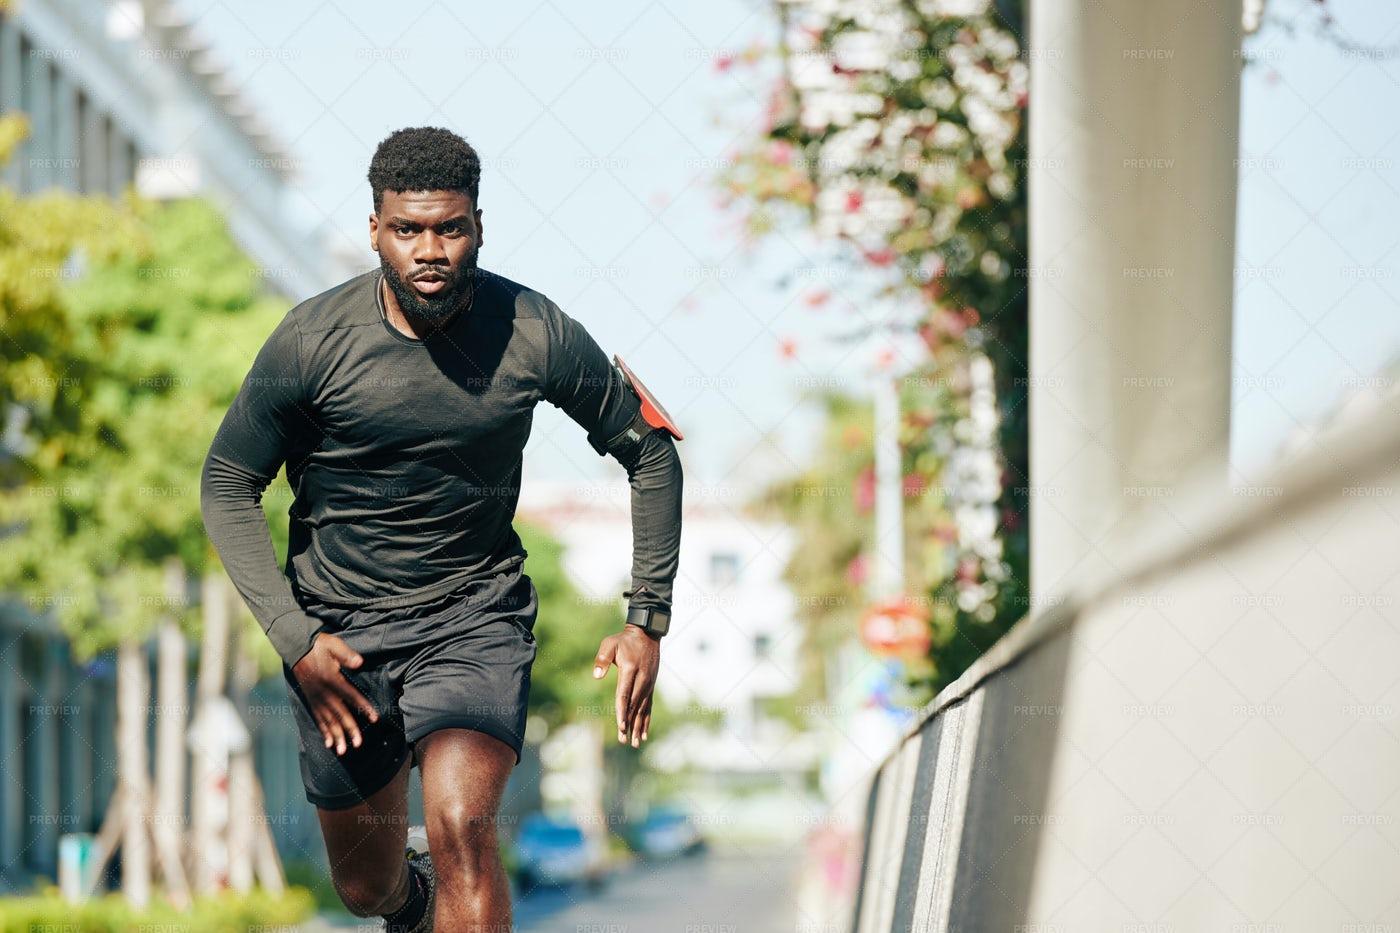 Man Running In The Street: Stock Photos